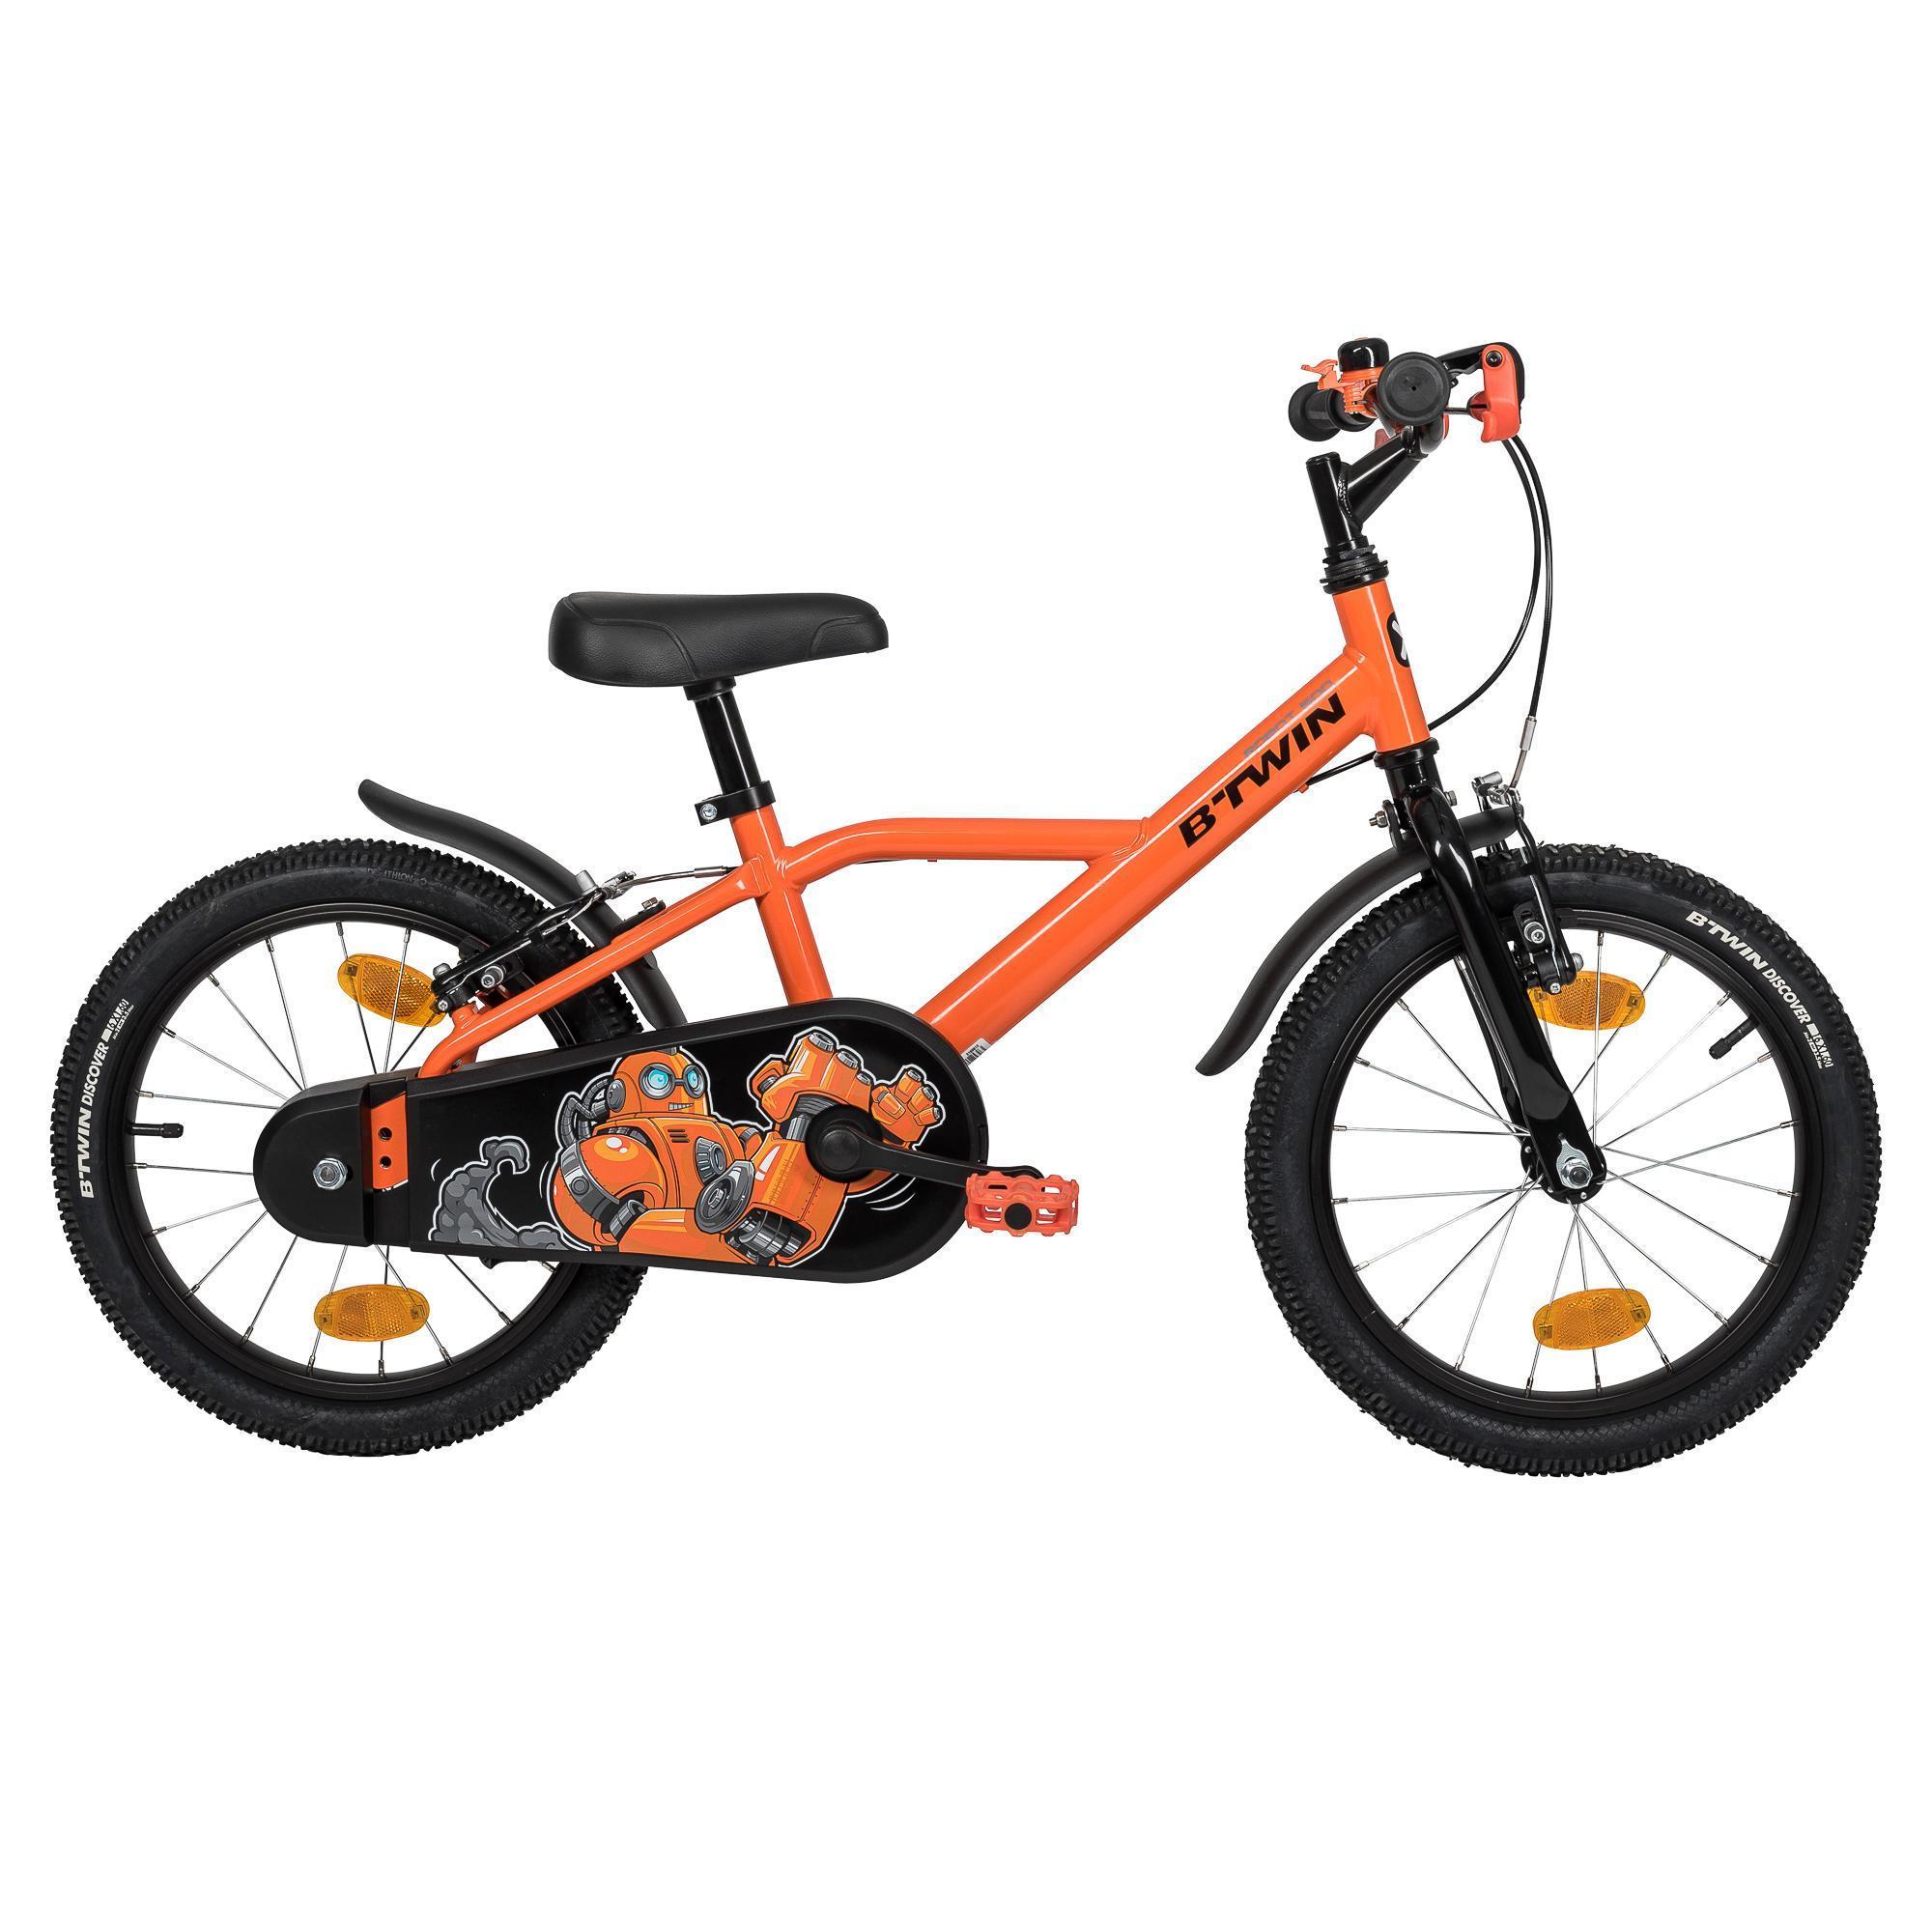 Kinderfahrrad Günstige Moderne Räder Btwin Decathlon